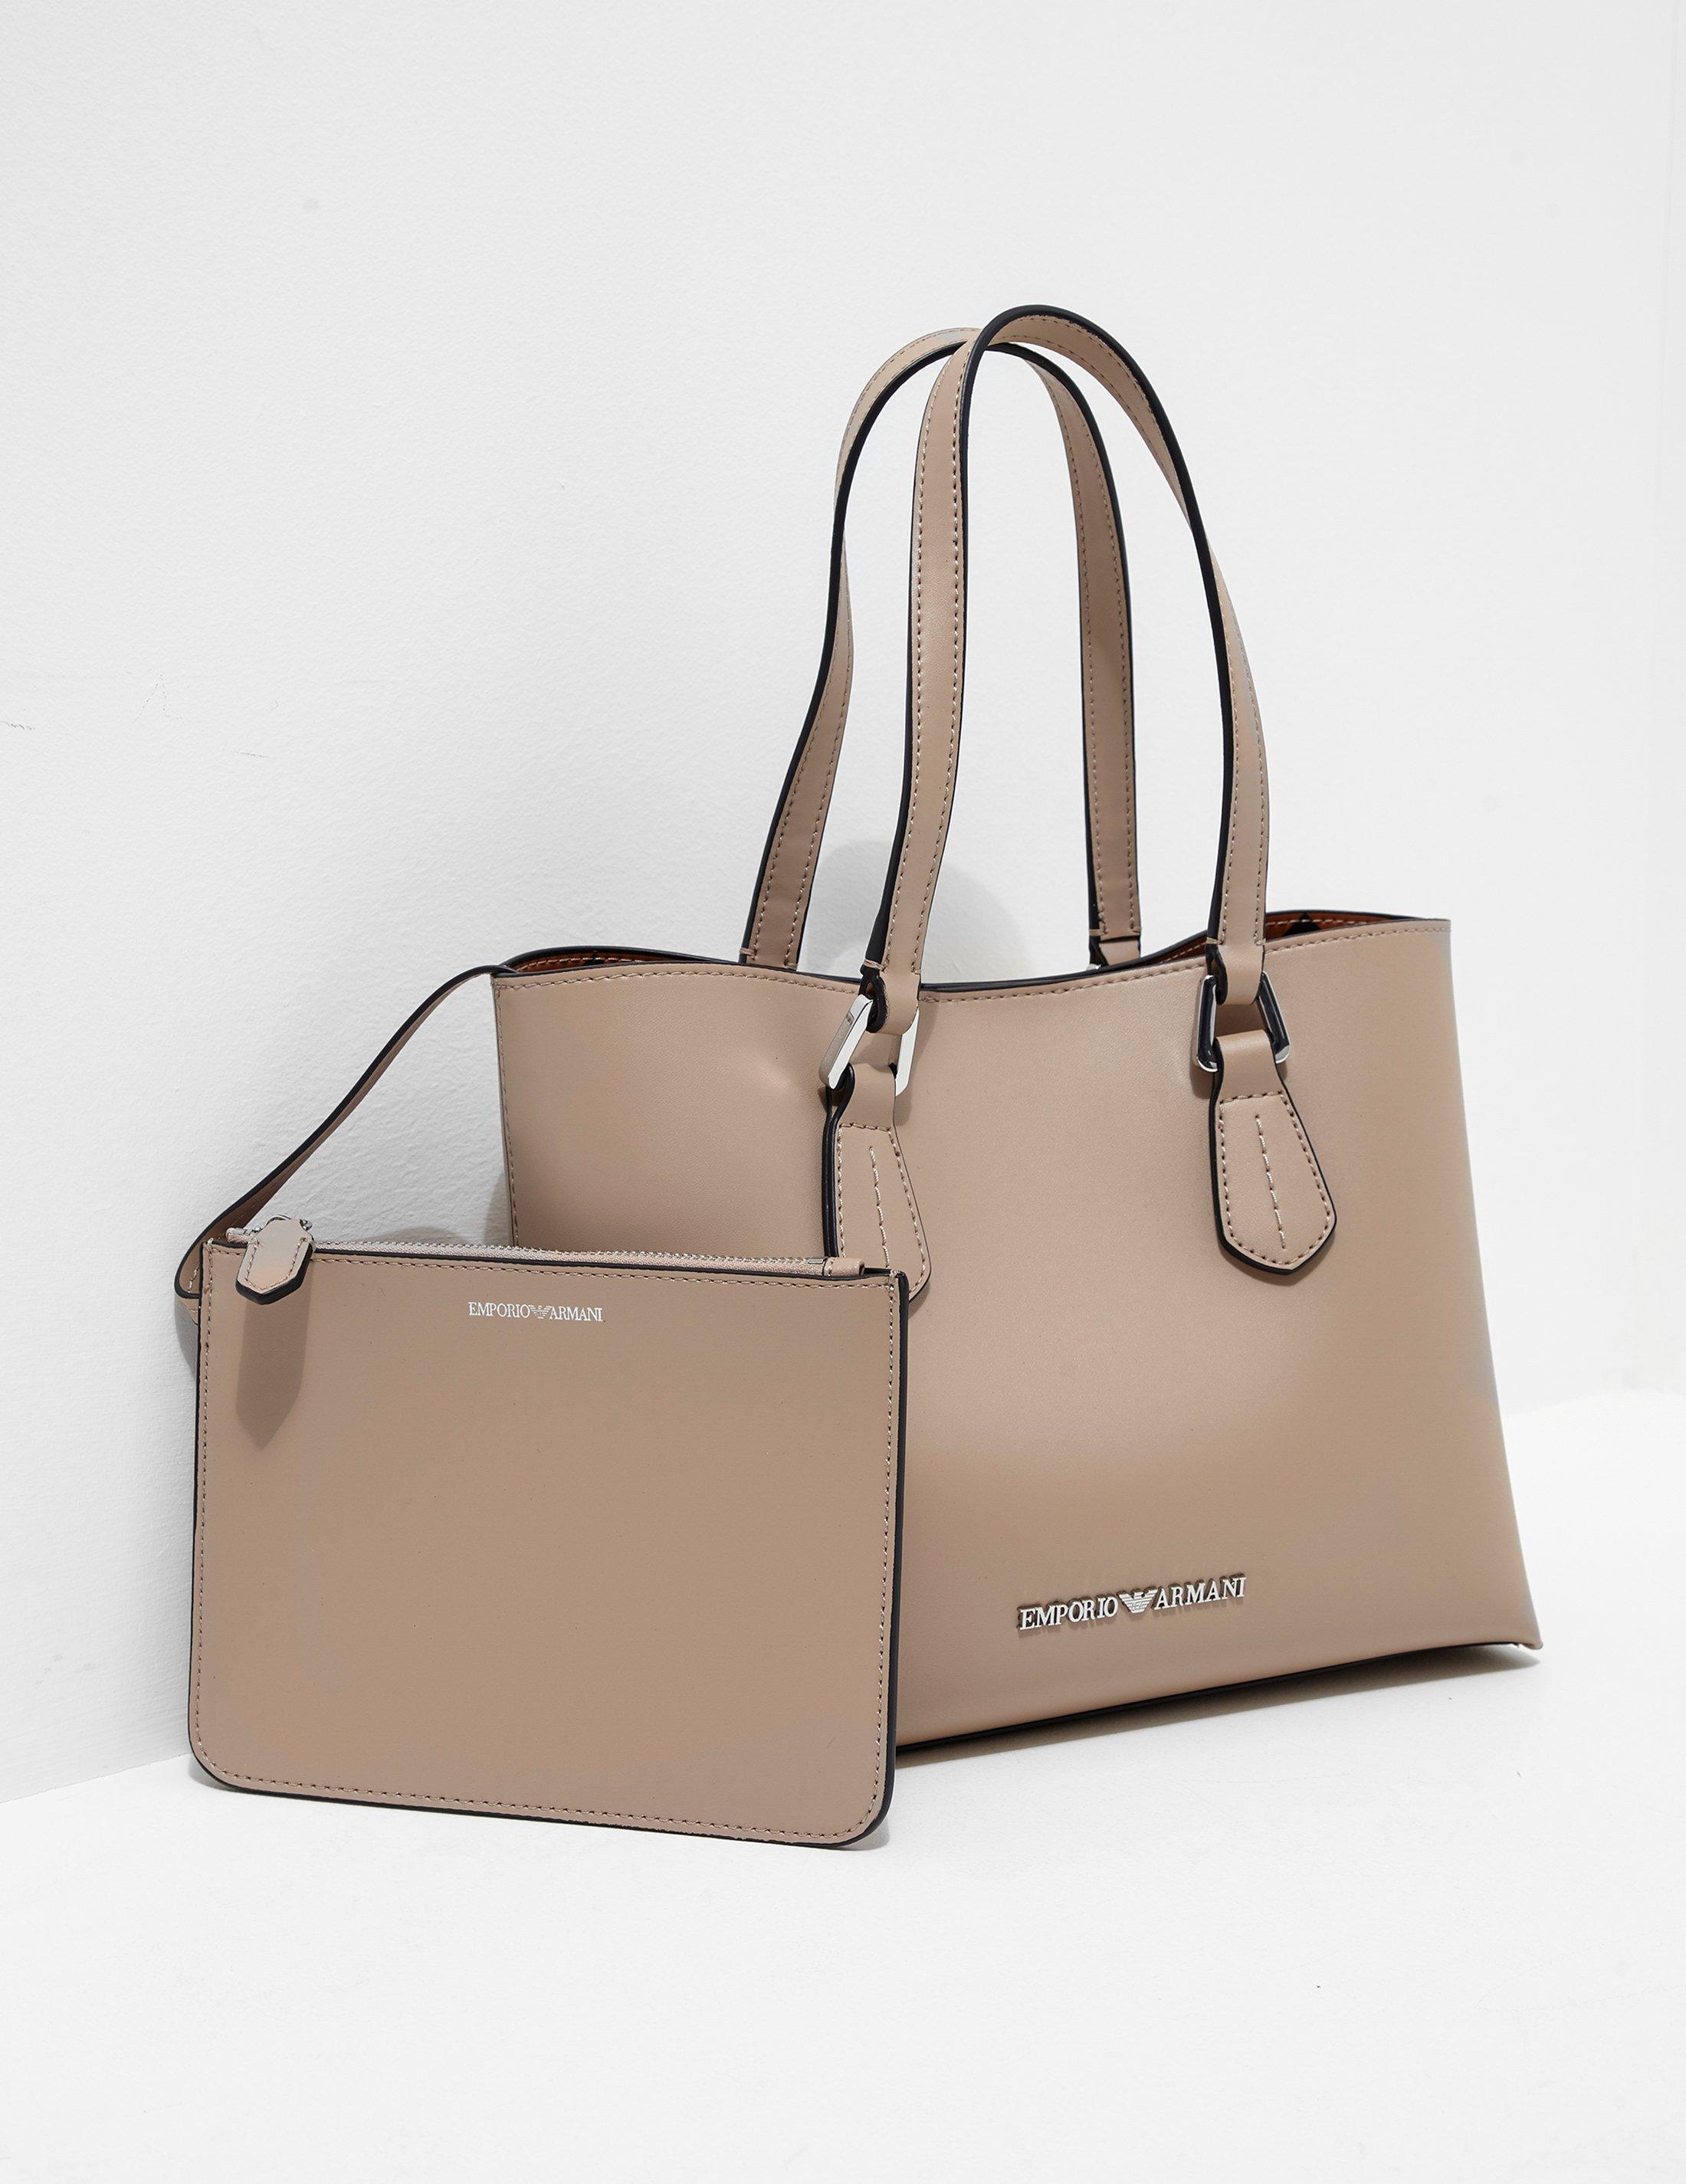 70e50af5f946 Lyst - Emporio Armani Womens Wilma Medium Shopper Bag Beige in Natural